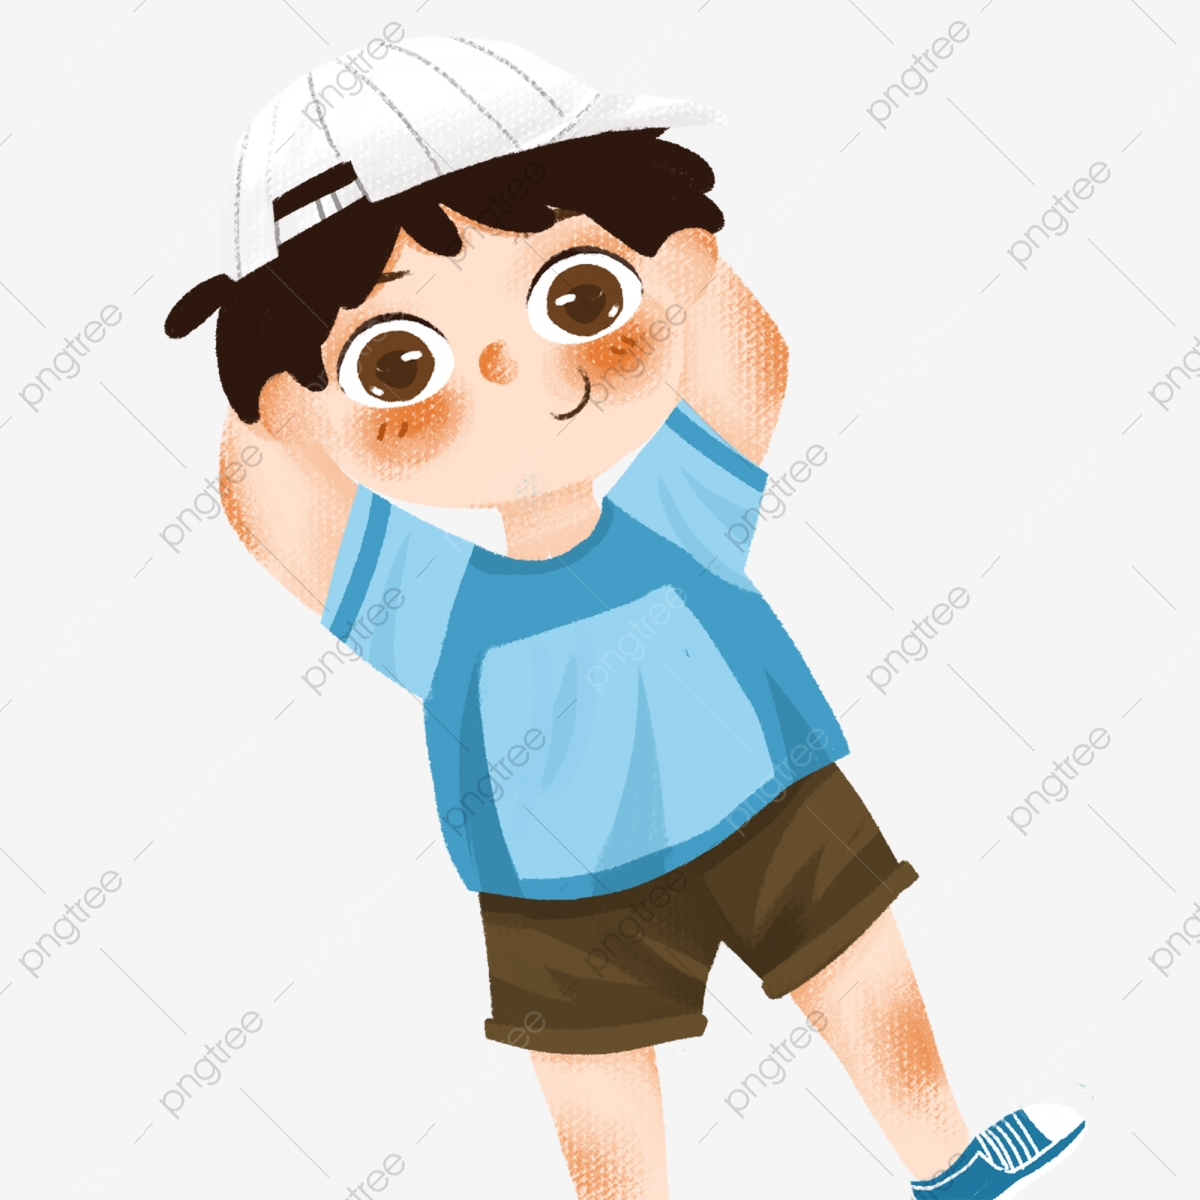 Nino Con Gorra De Beisbol Nino Pequeno Lindo Nino De Dibujos Animados Nino Atletico Dibujado A Mano Nino Con Gorra De Beisbol Nino Dibujado Mano Lindo Nino De Grandes Ojos Png Y